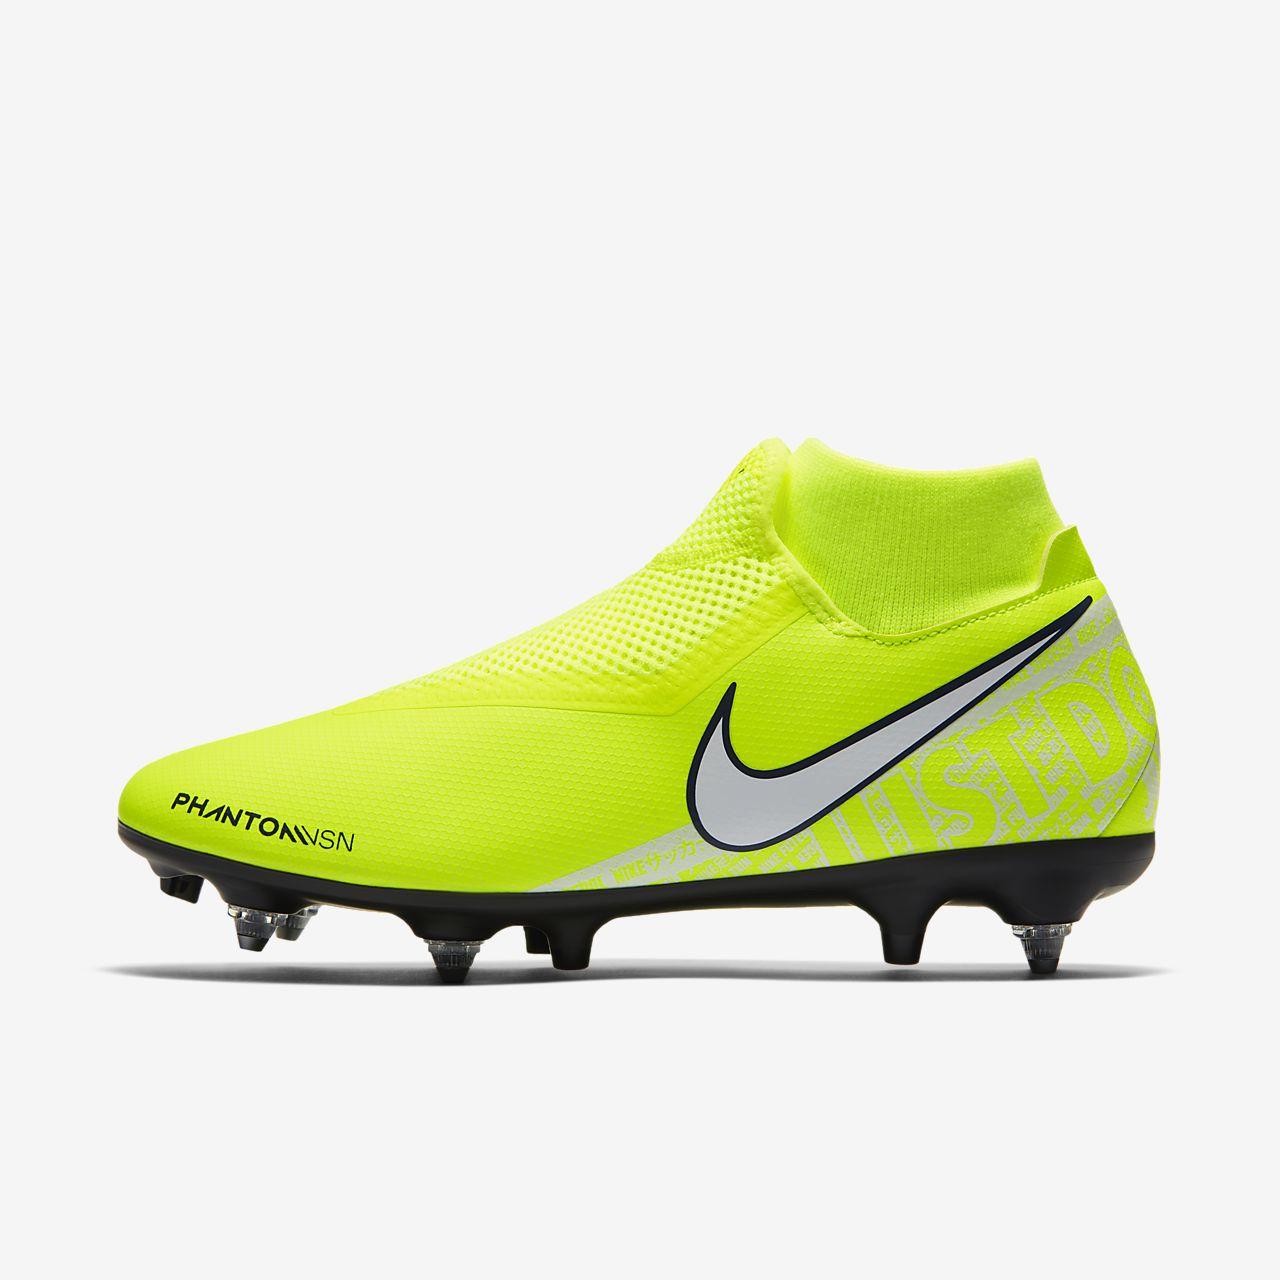 Scarpa da calcio per terreni morbidi Nike PhantomVSN Academy Dynamic Fit SG Pro Anti Clog Traction